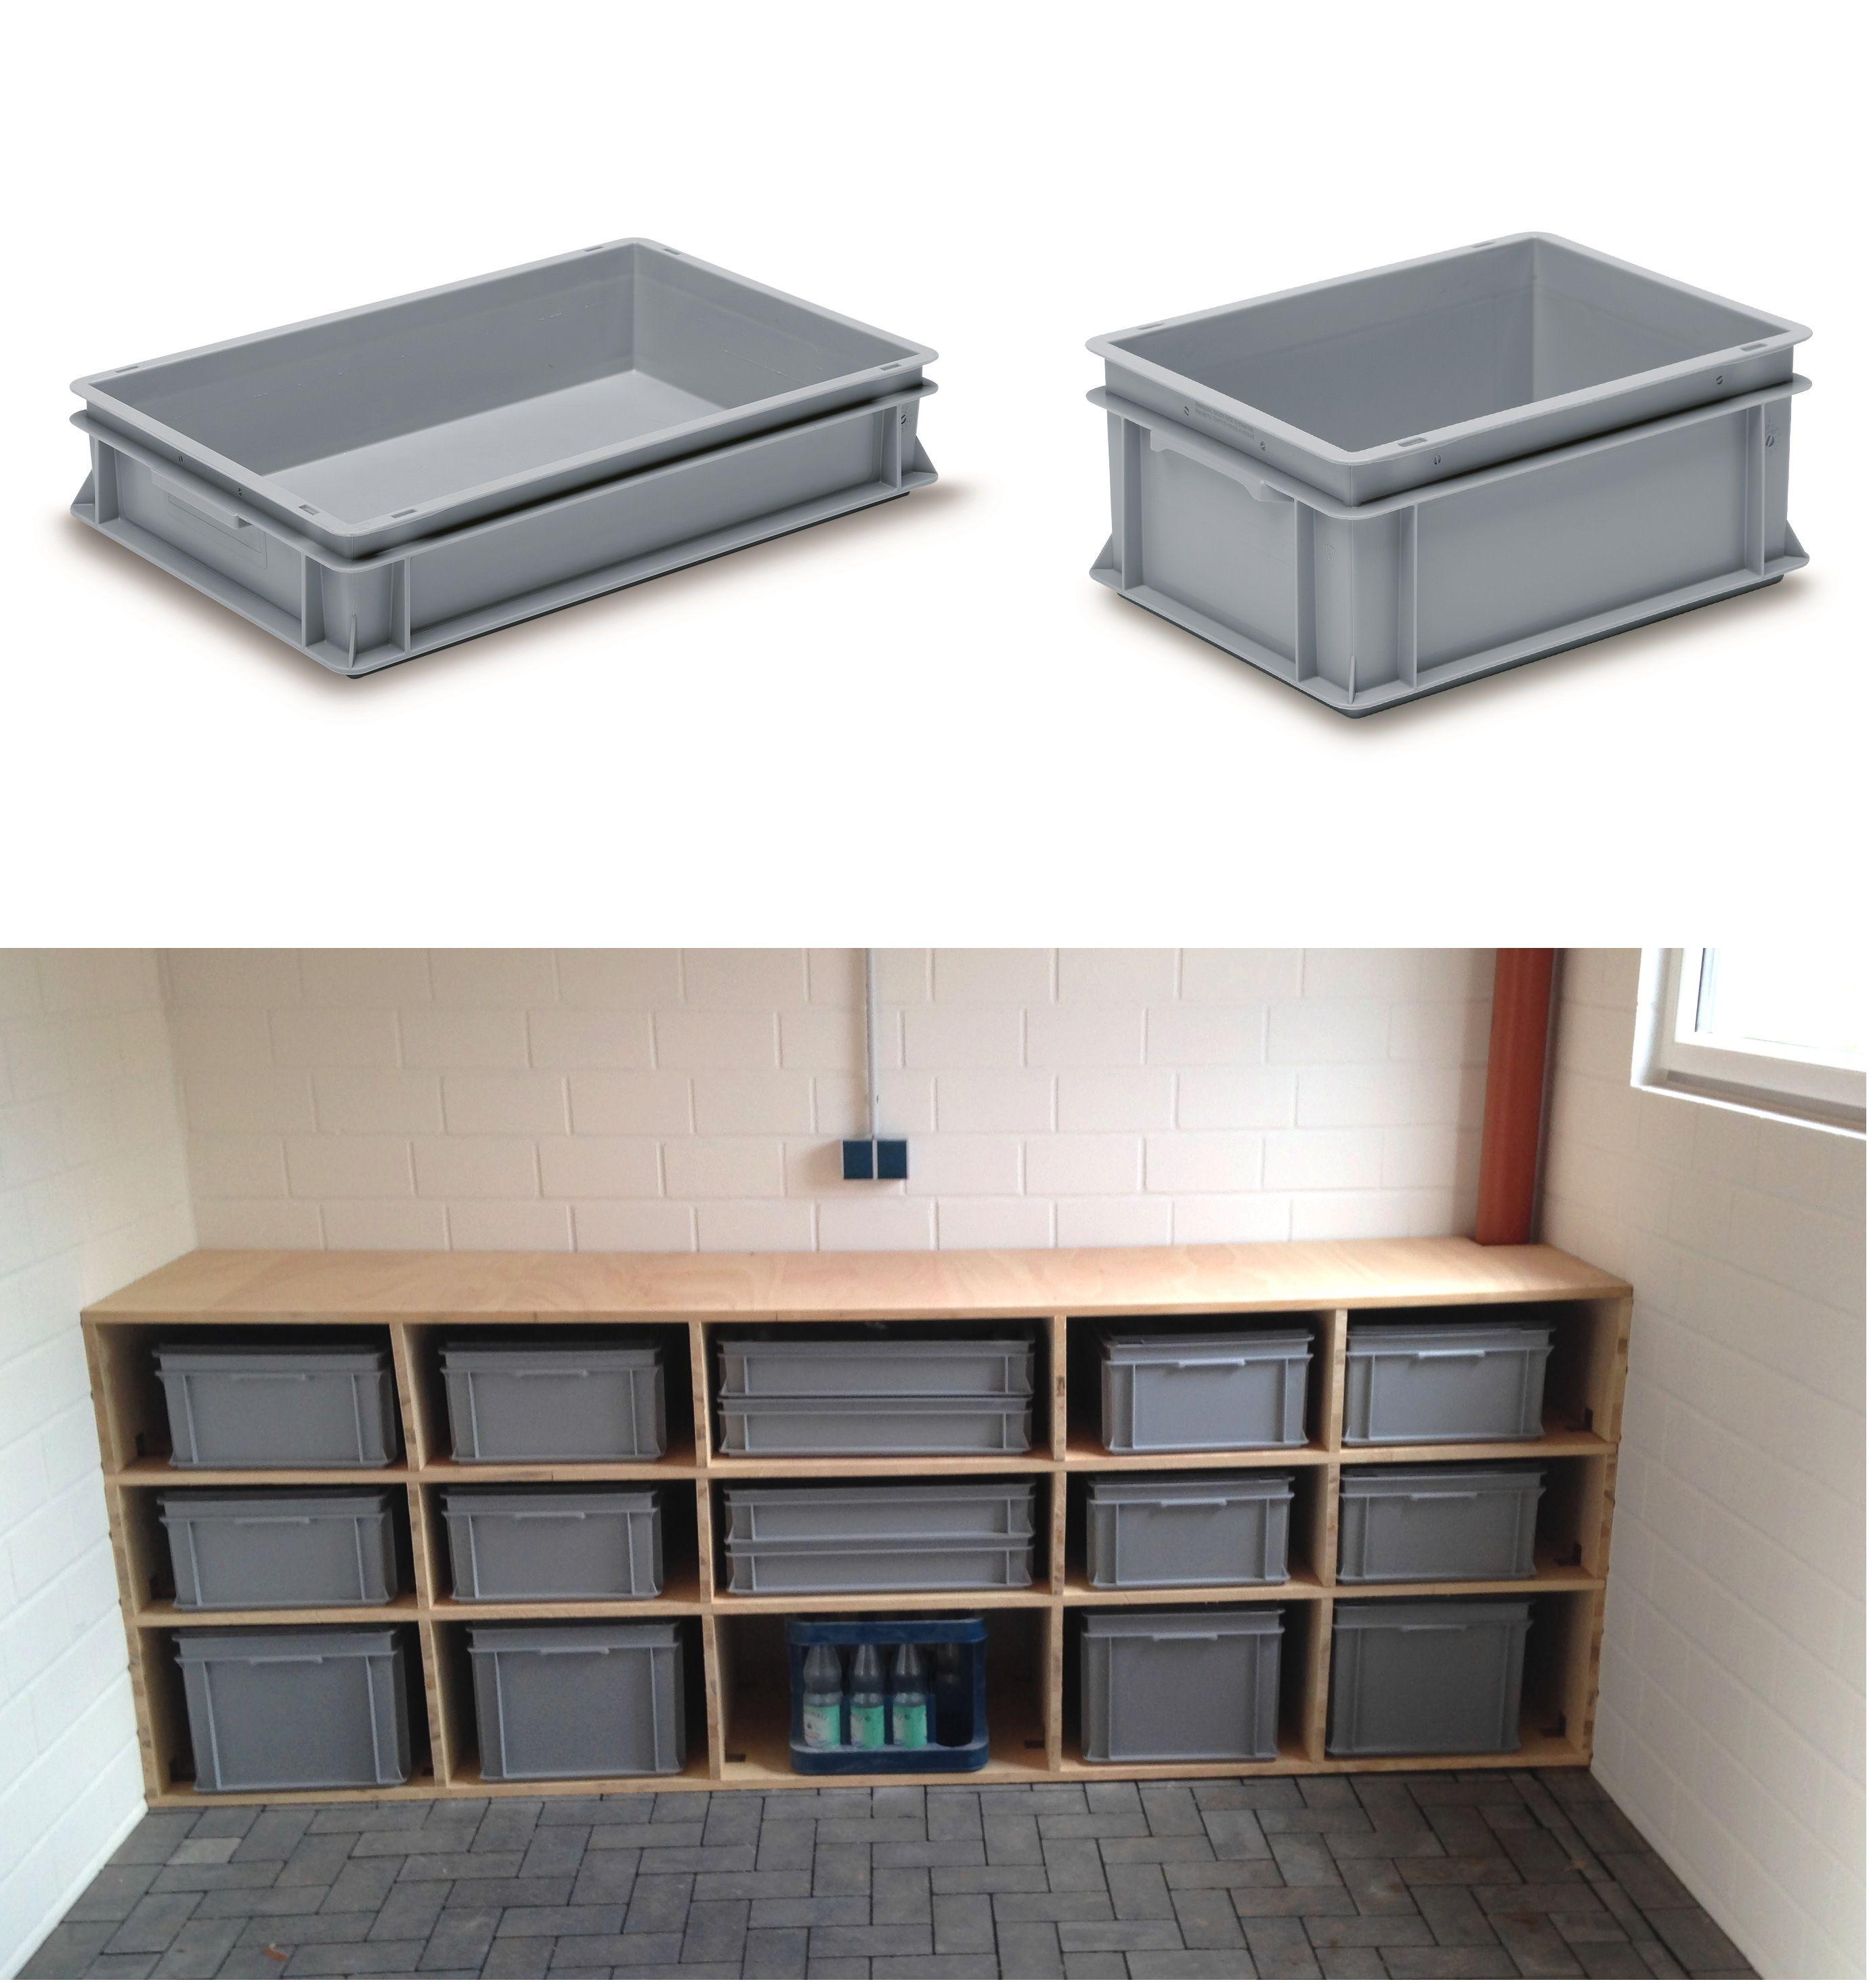 ordnung schaffen rako beh lter aus kunststoff in verschiedenen gr en im individuellen. Black Bedroom Furniture Sets. Home Design Ideas